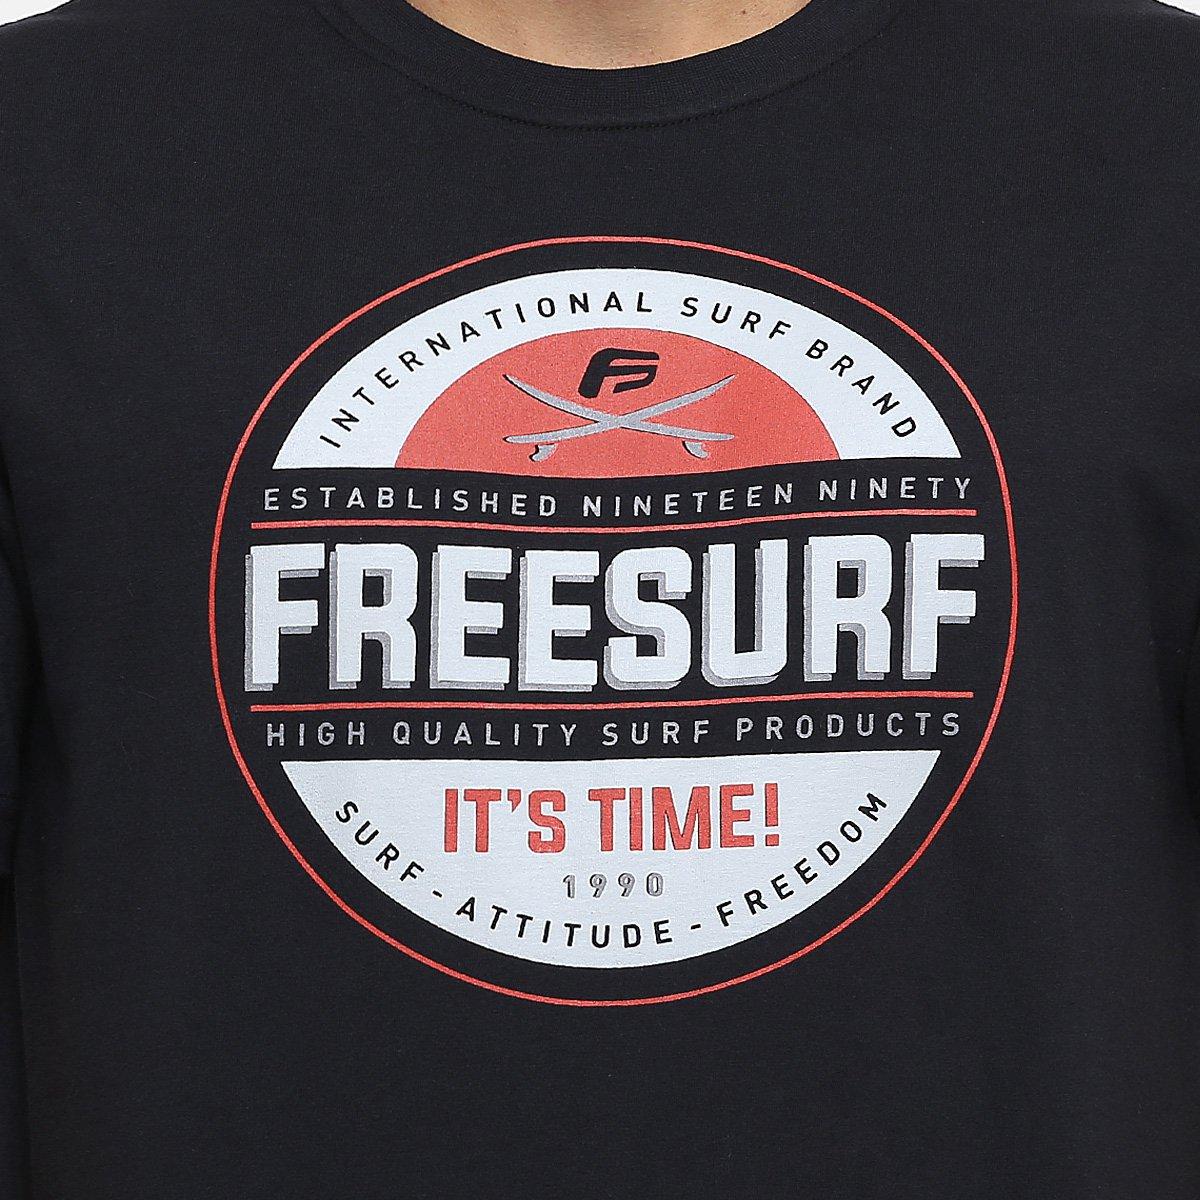 0c9a88121d6ef Camiseta Free Surf Basica Attitude  Camiseta Free Surf Basica Attitude ...